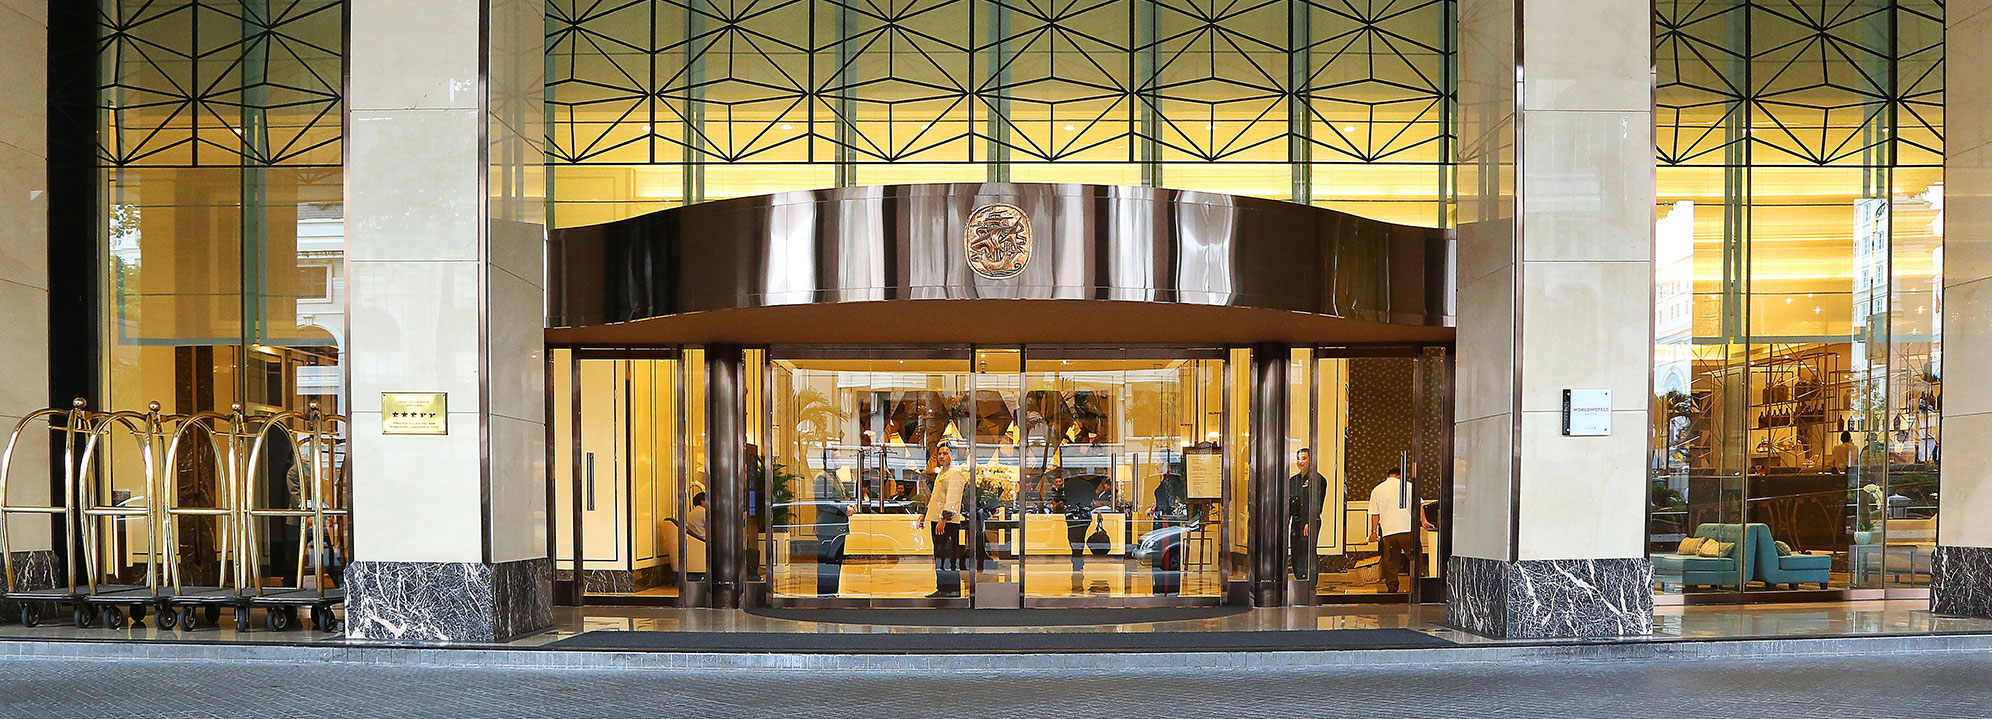 Giới thiệu khách sạn Caravelle saigon